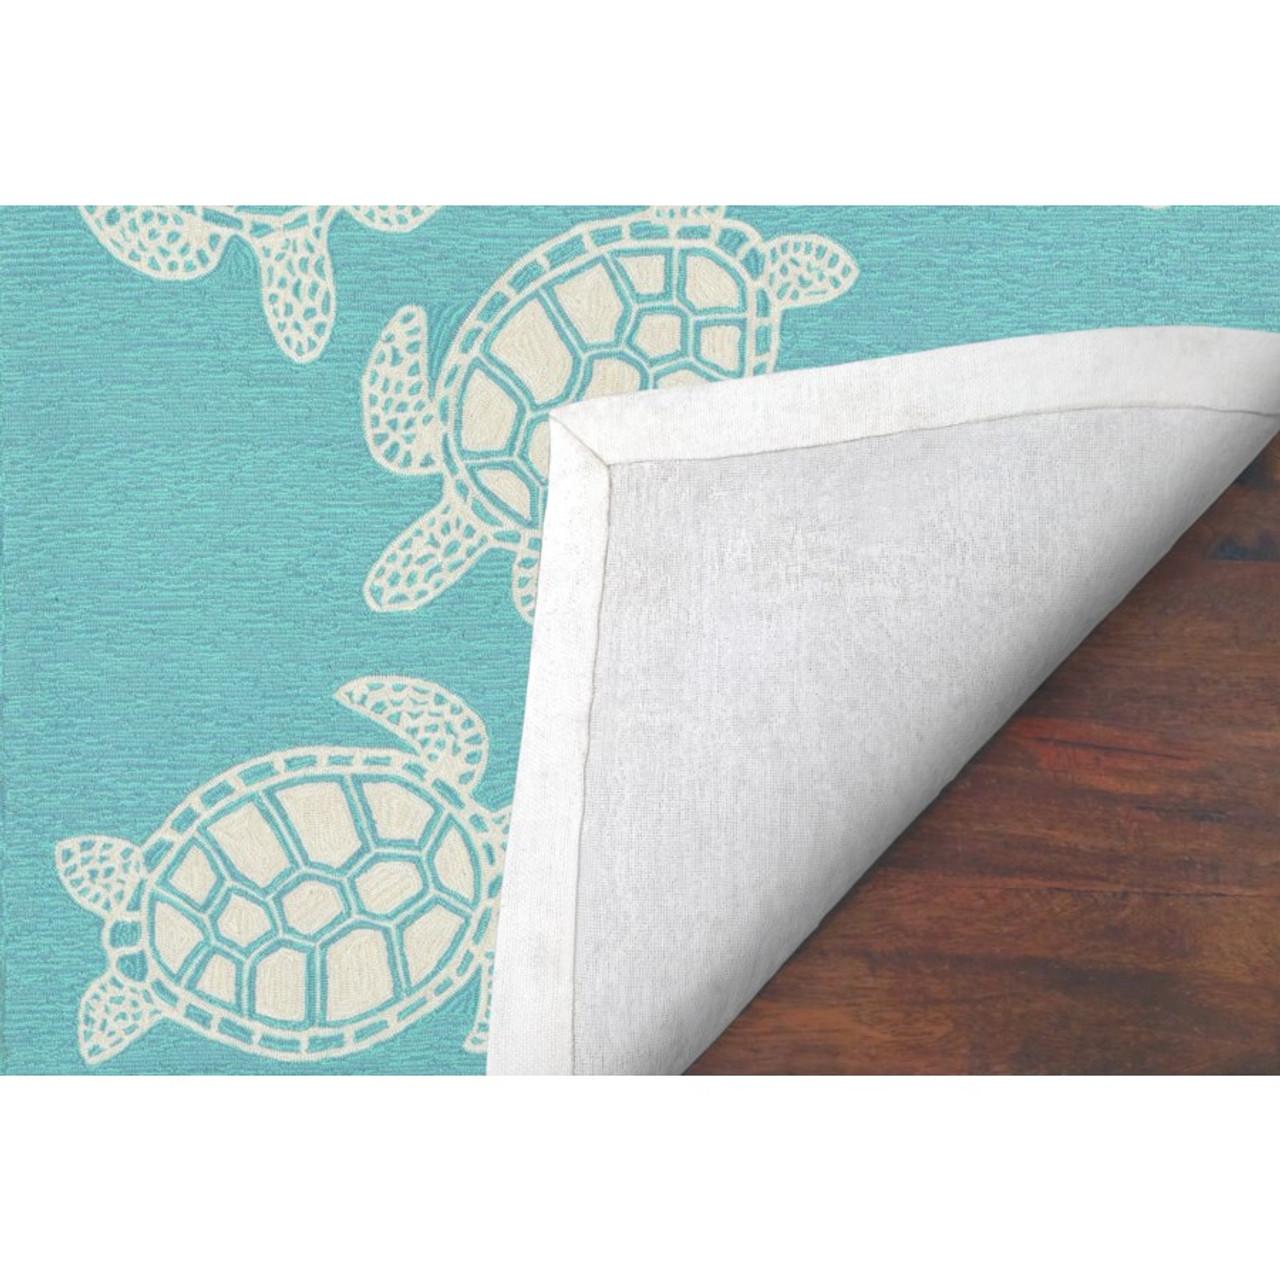 Capri Turtle Indoor/Outdoor Rug - Aqua - Backing